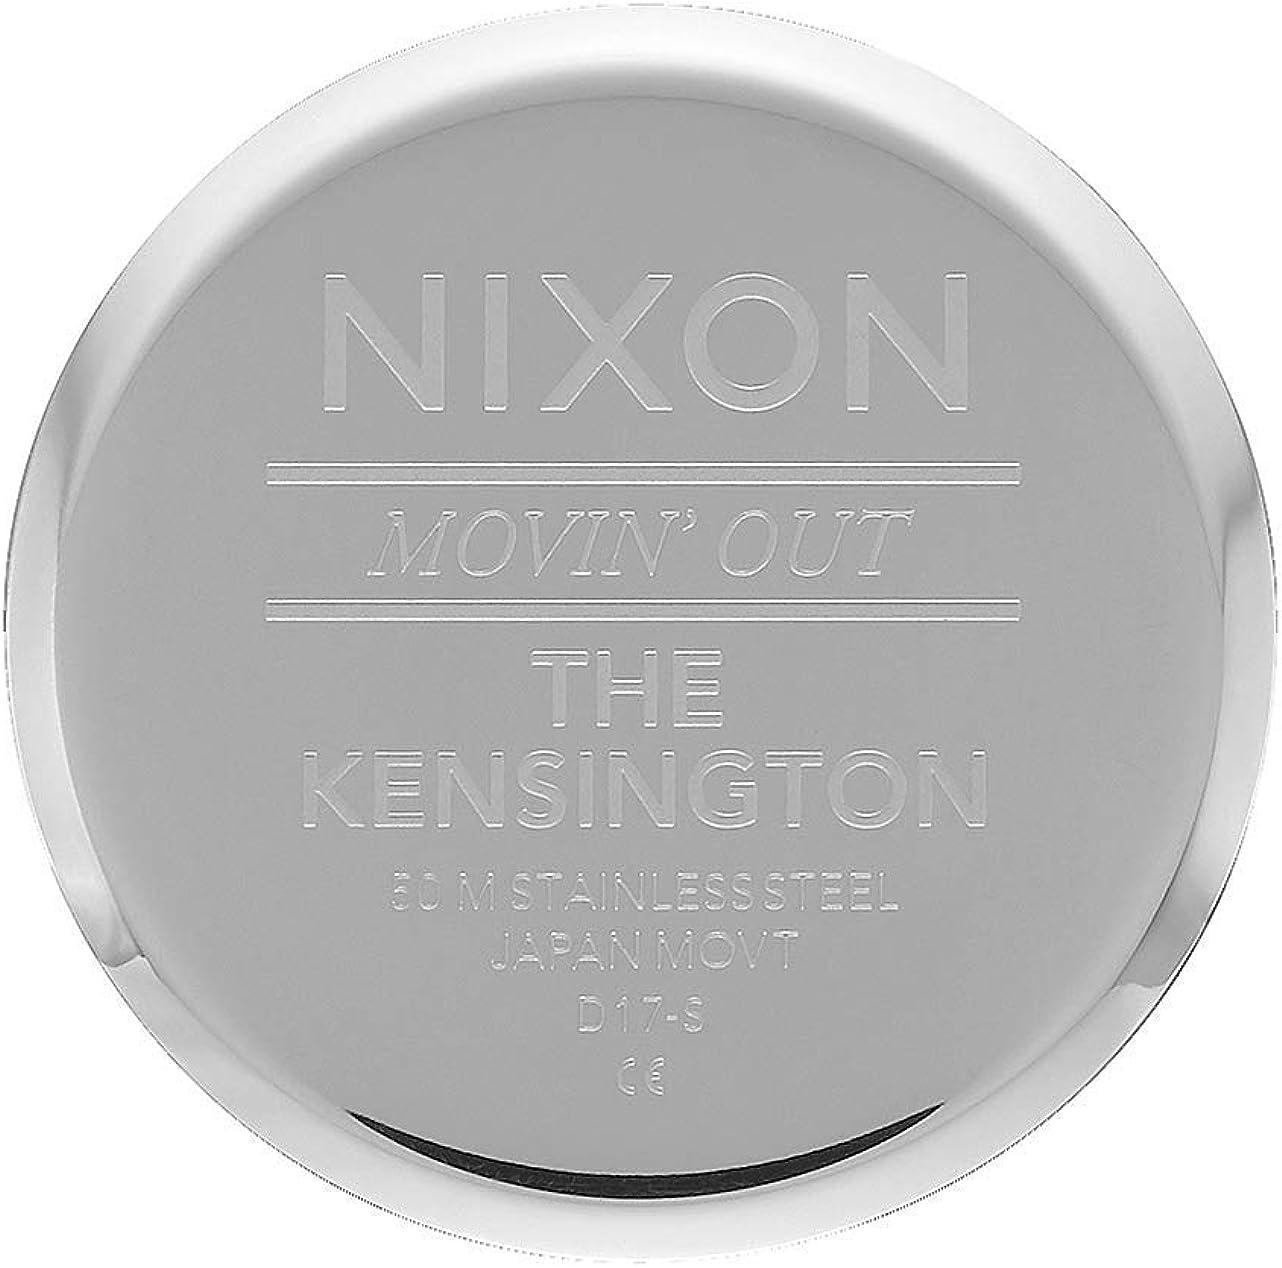 NIXON Kensington Stainless Steel Mesh Bracelet A1229 Silver / Safety